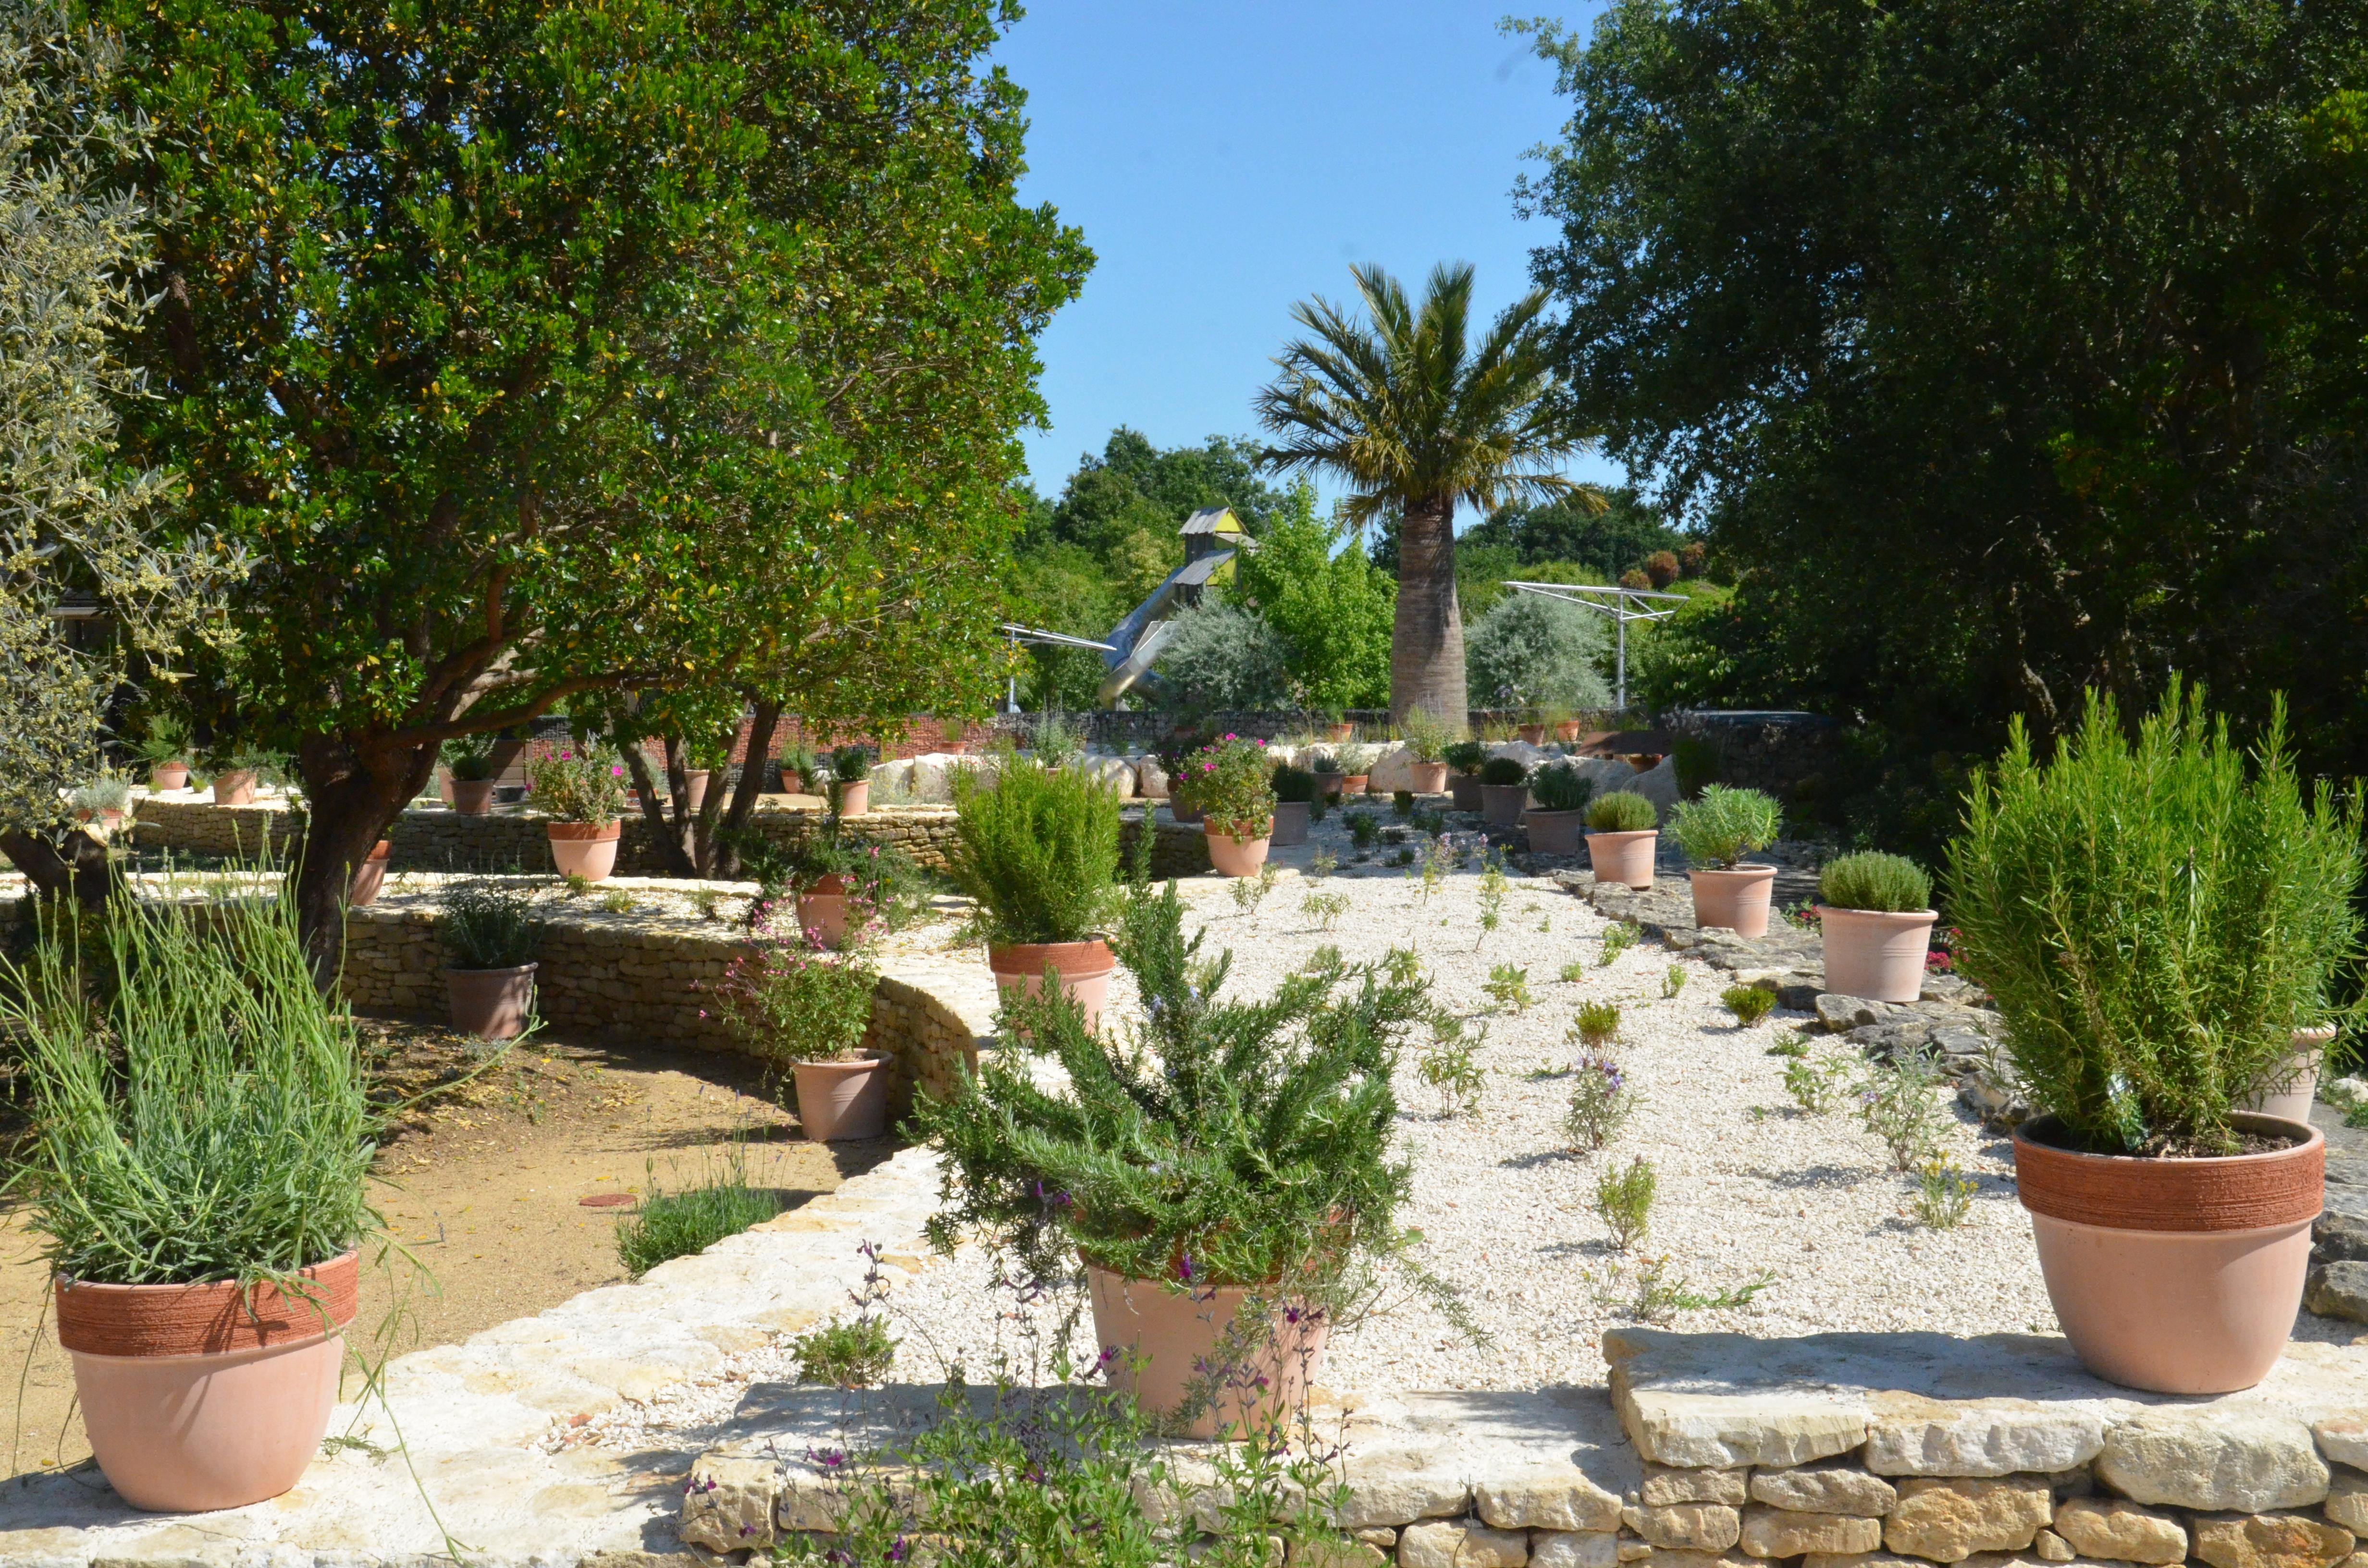 Le jardin sans eau (c) Terra Botanica 2 ok